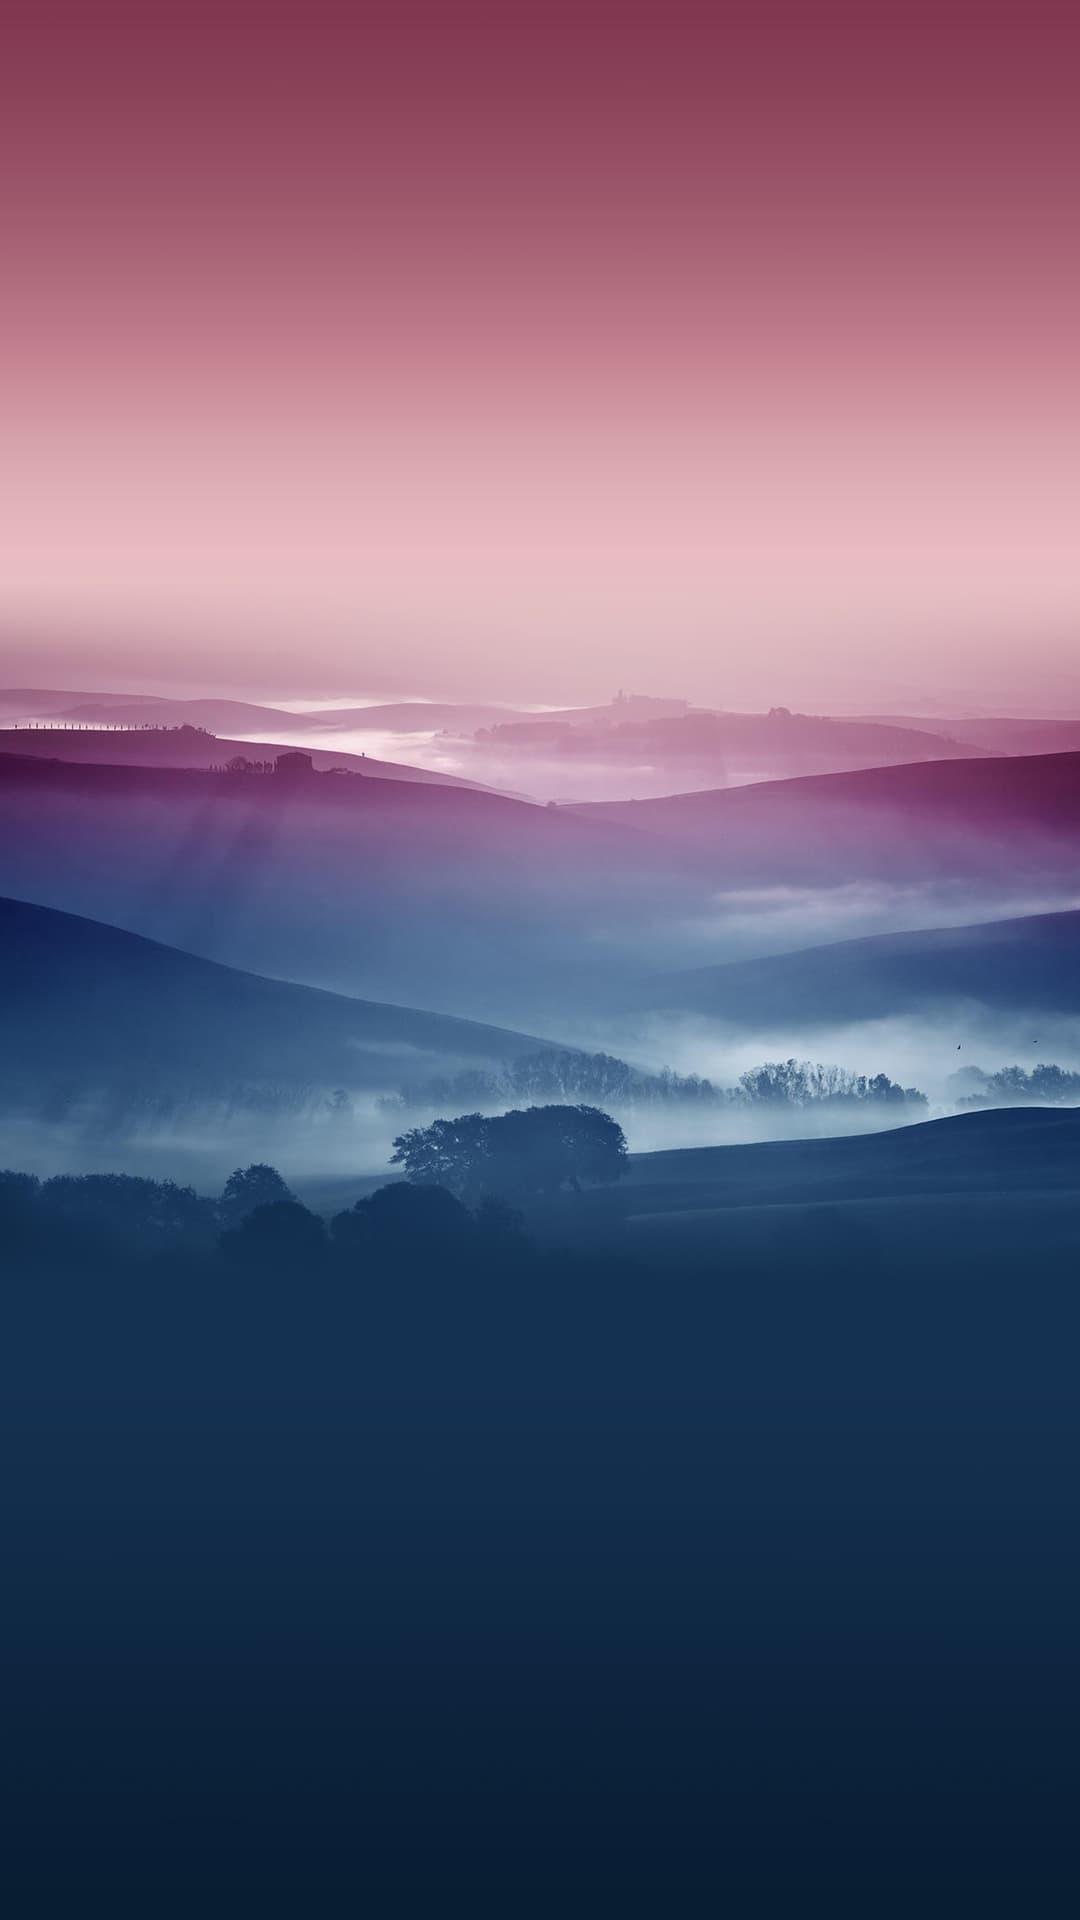 Misty Hills Landscape Android Wallpaper